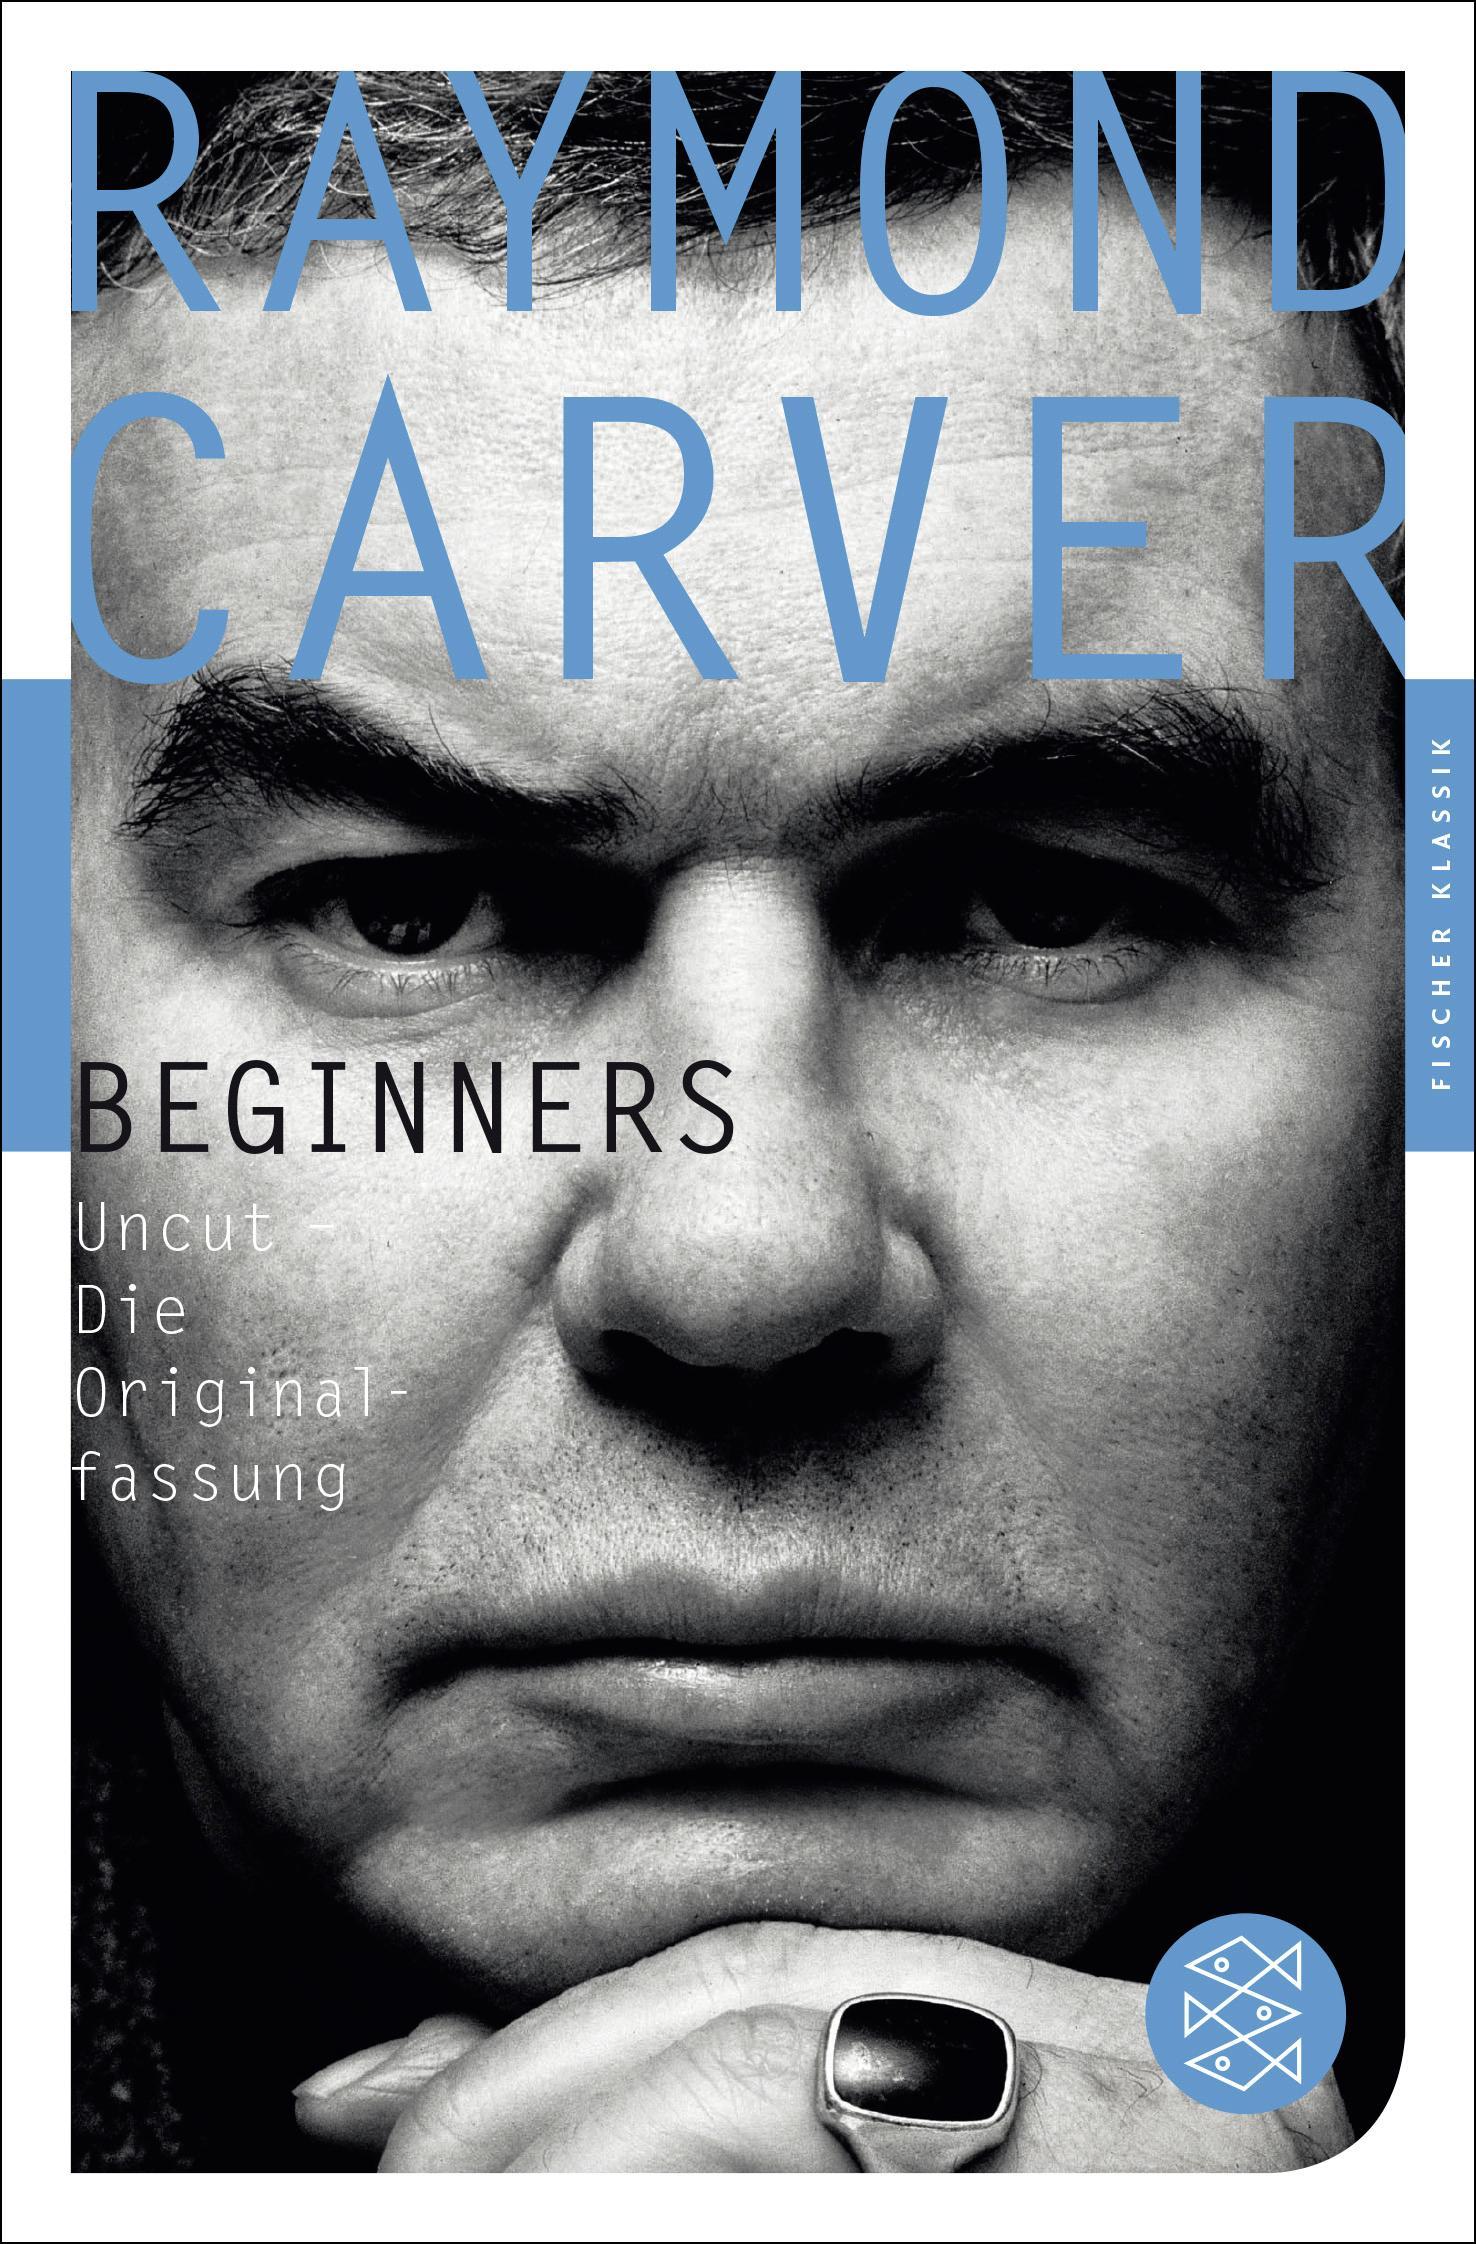 Beginners-Raymond-Carver